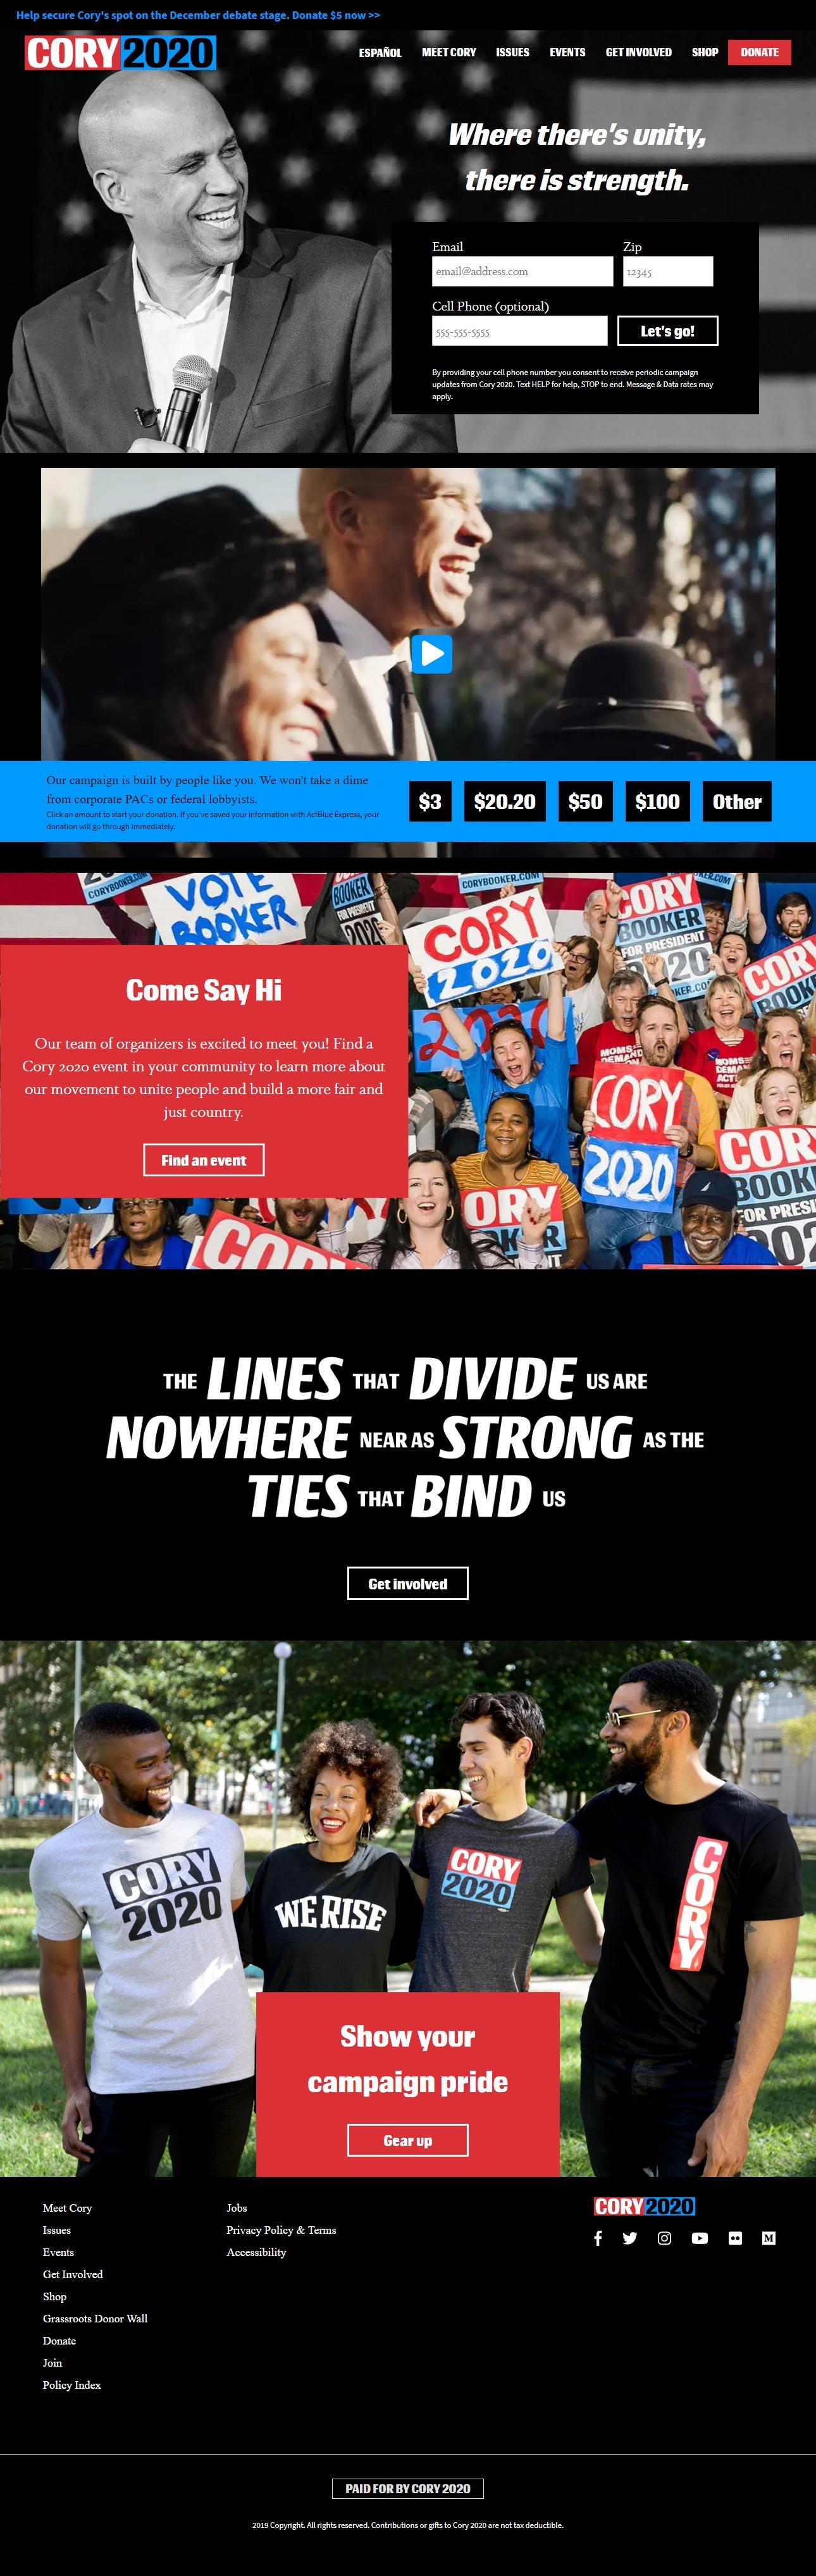 Homepage Snapshot for December 1, 2019: Senator Cory Booker